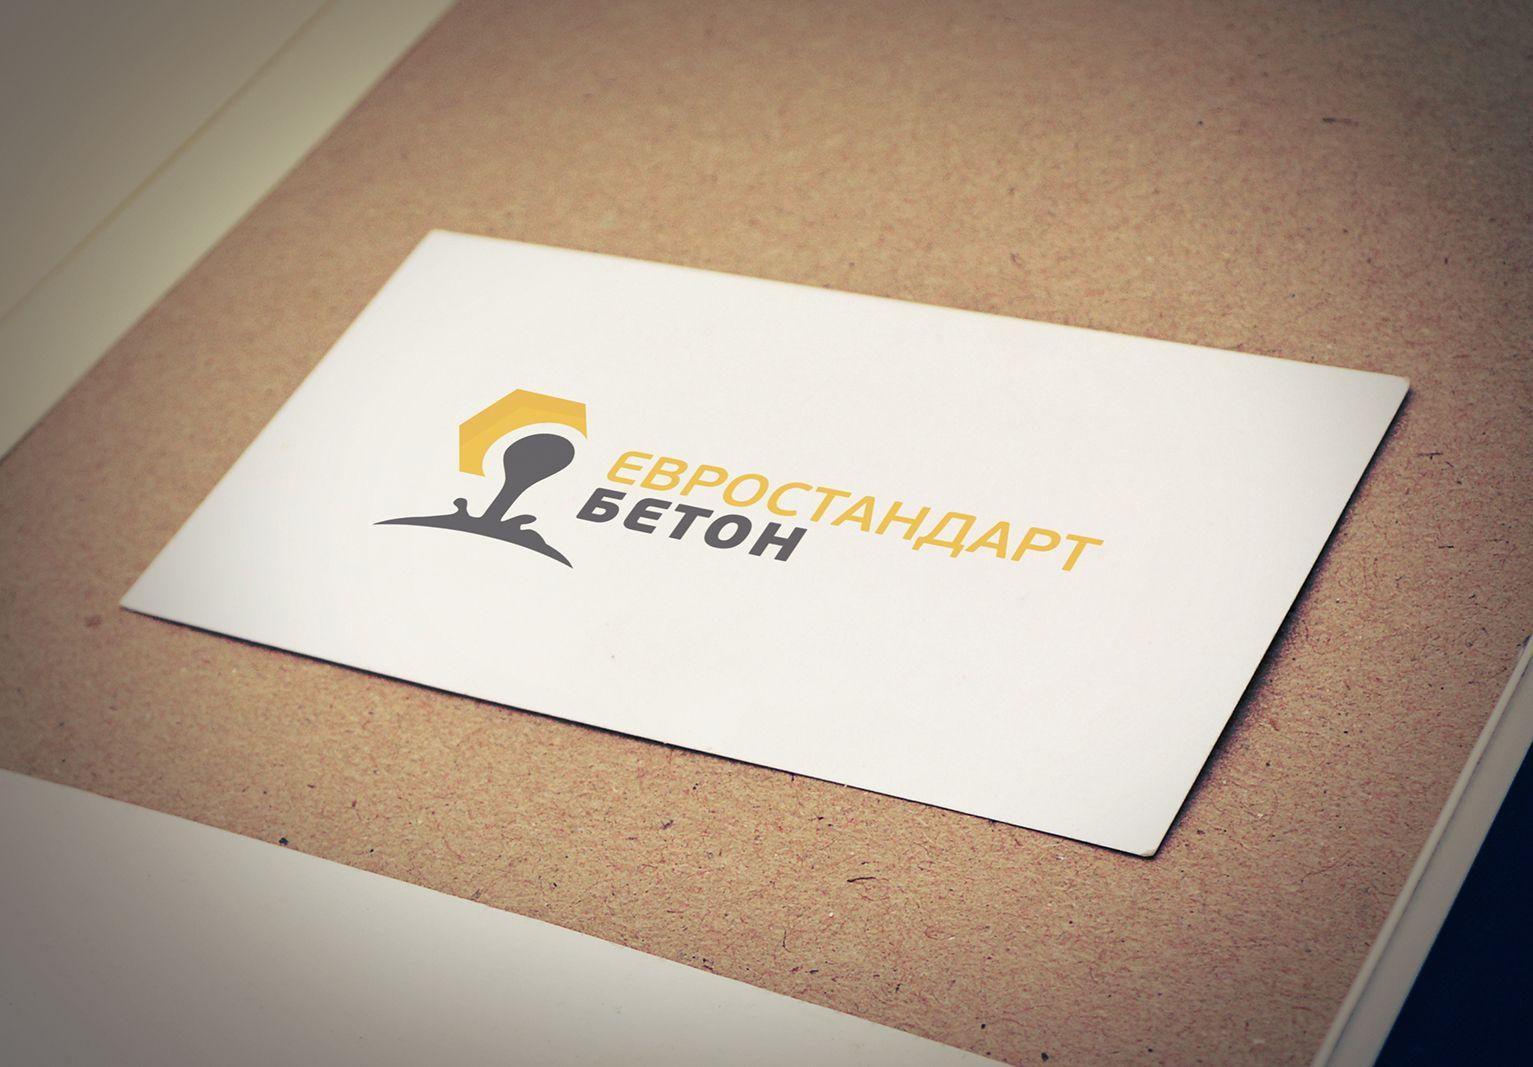 Логотип для ЕвроСтандарт Бетон - дизайнер Da4erry